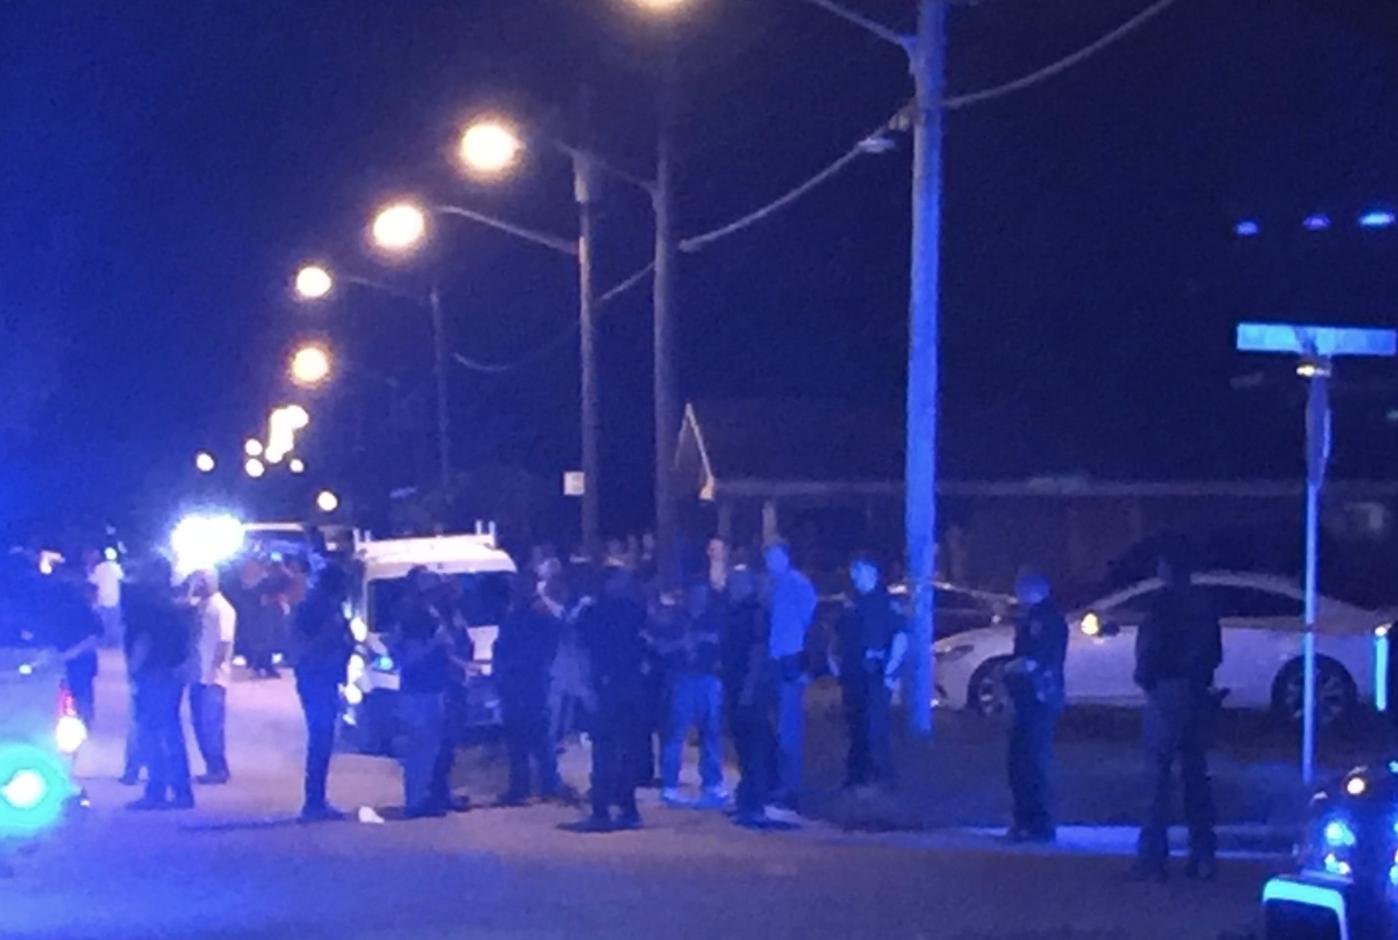 Martin County: Deputy shoots and kills machete wielding man